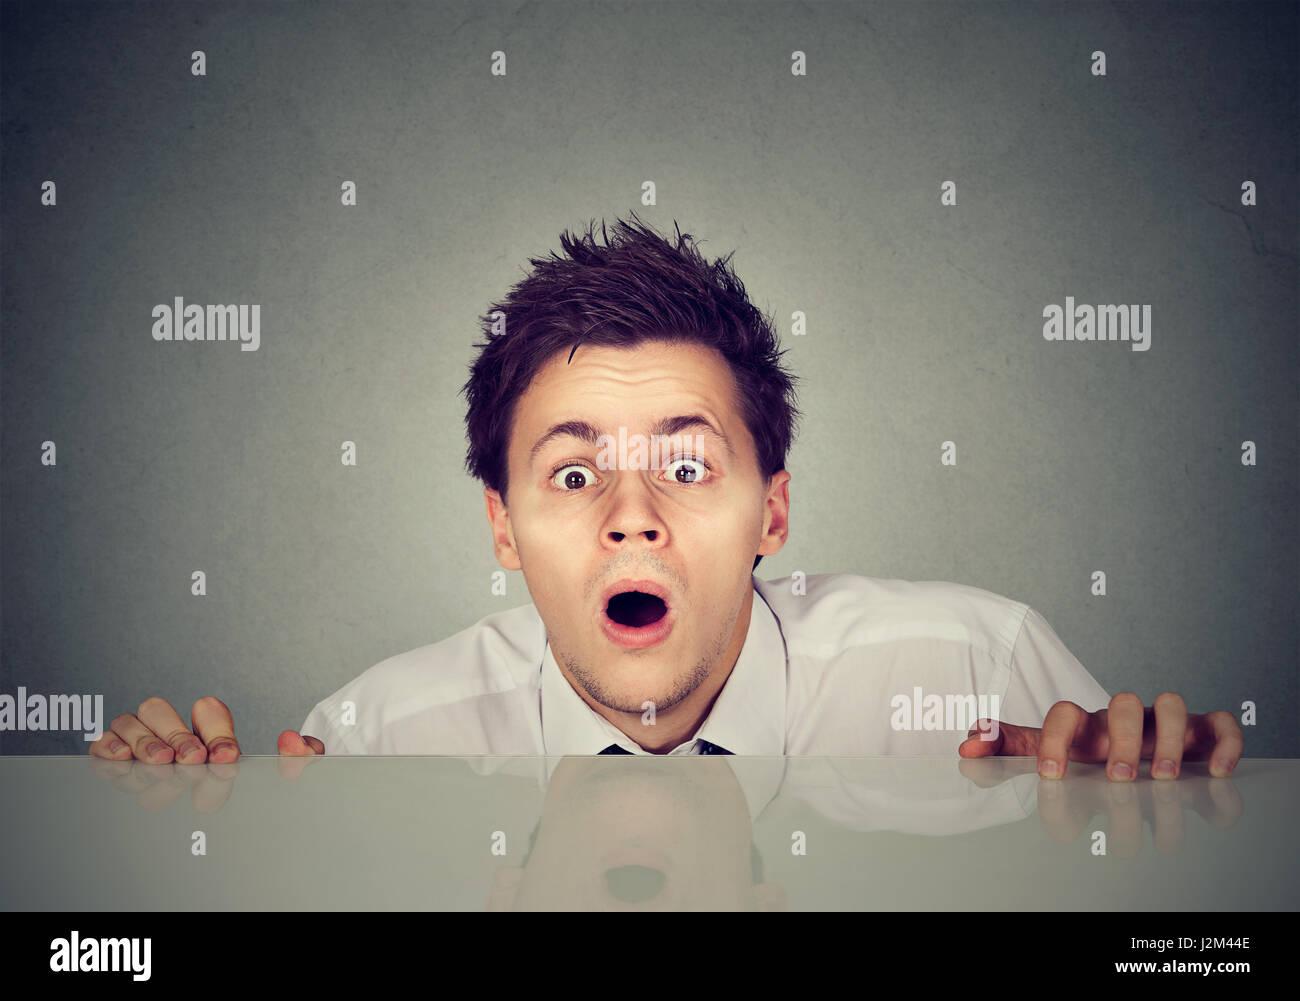 Jeune homme inquiet regarde camera Photo Stock